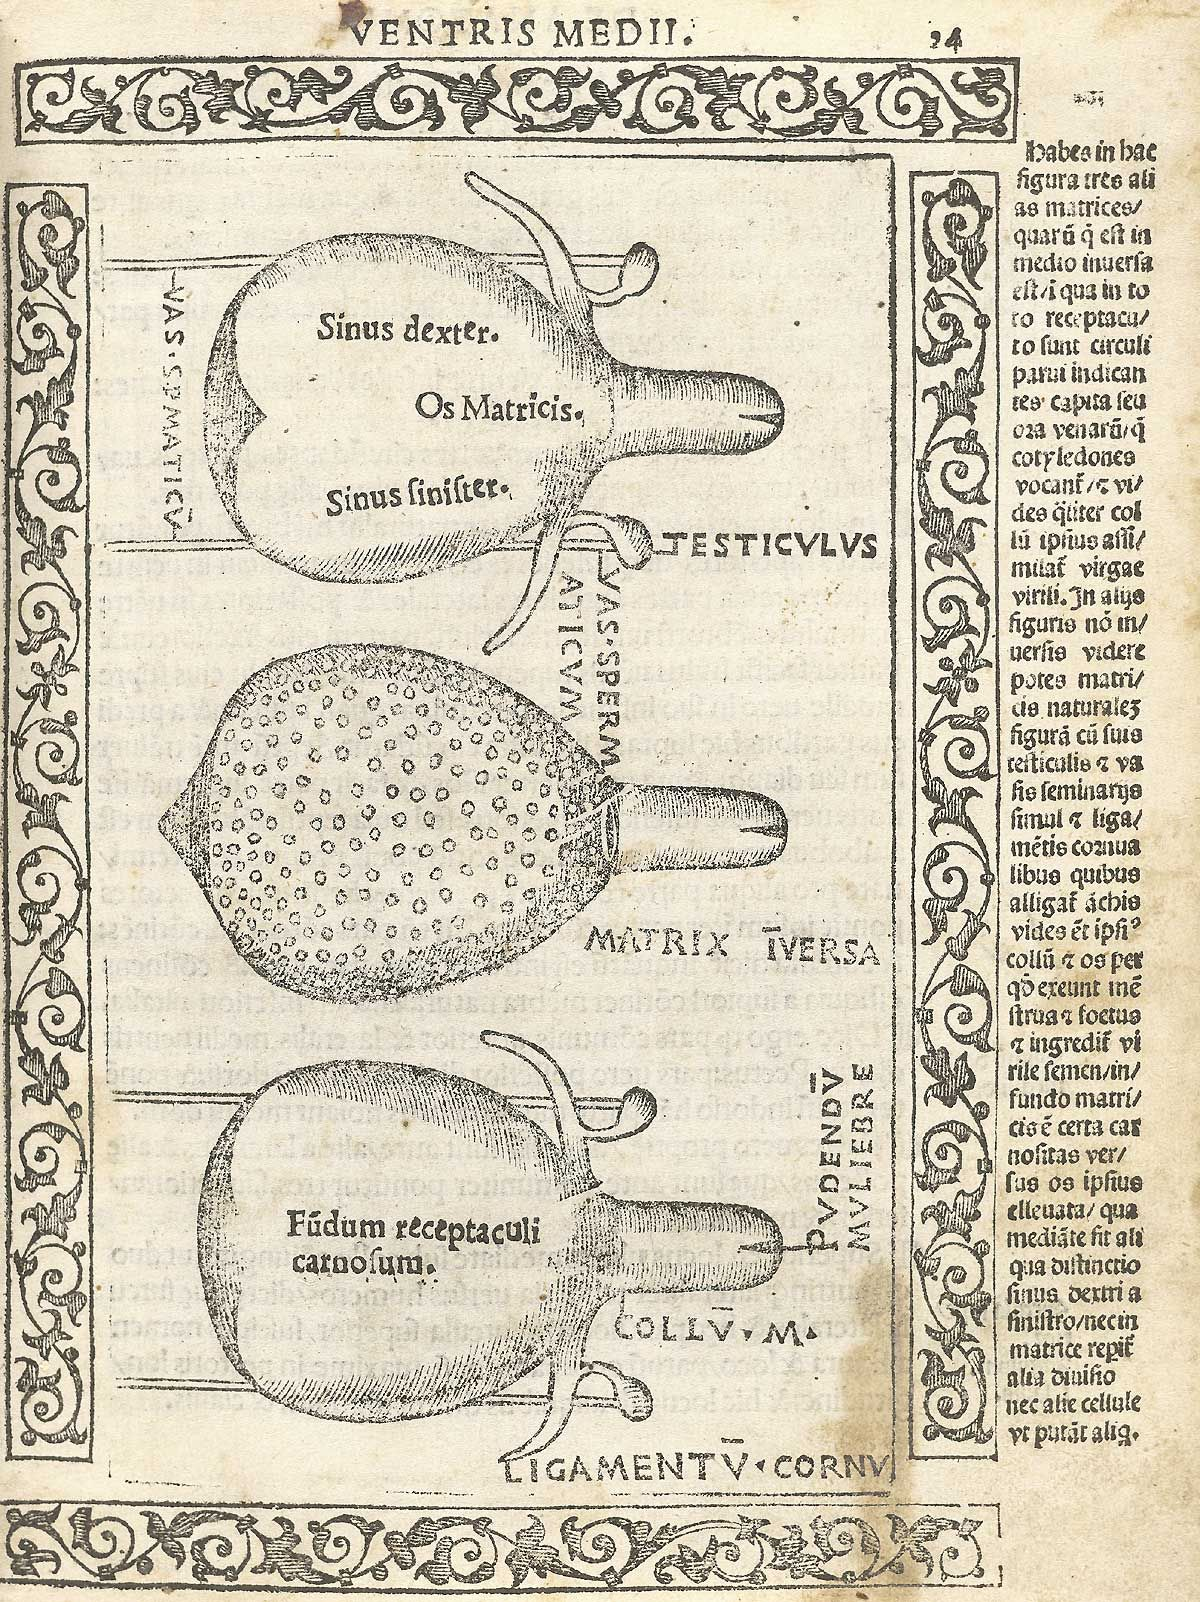 Pin By Andrew Arov On Anatomia Carpi Pinterest Ancient Art